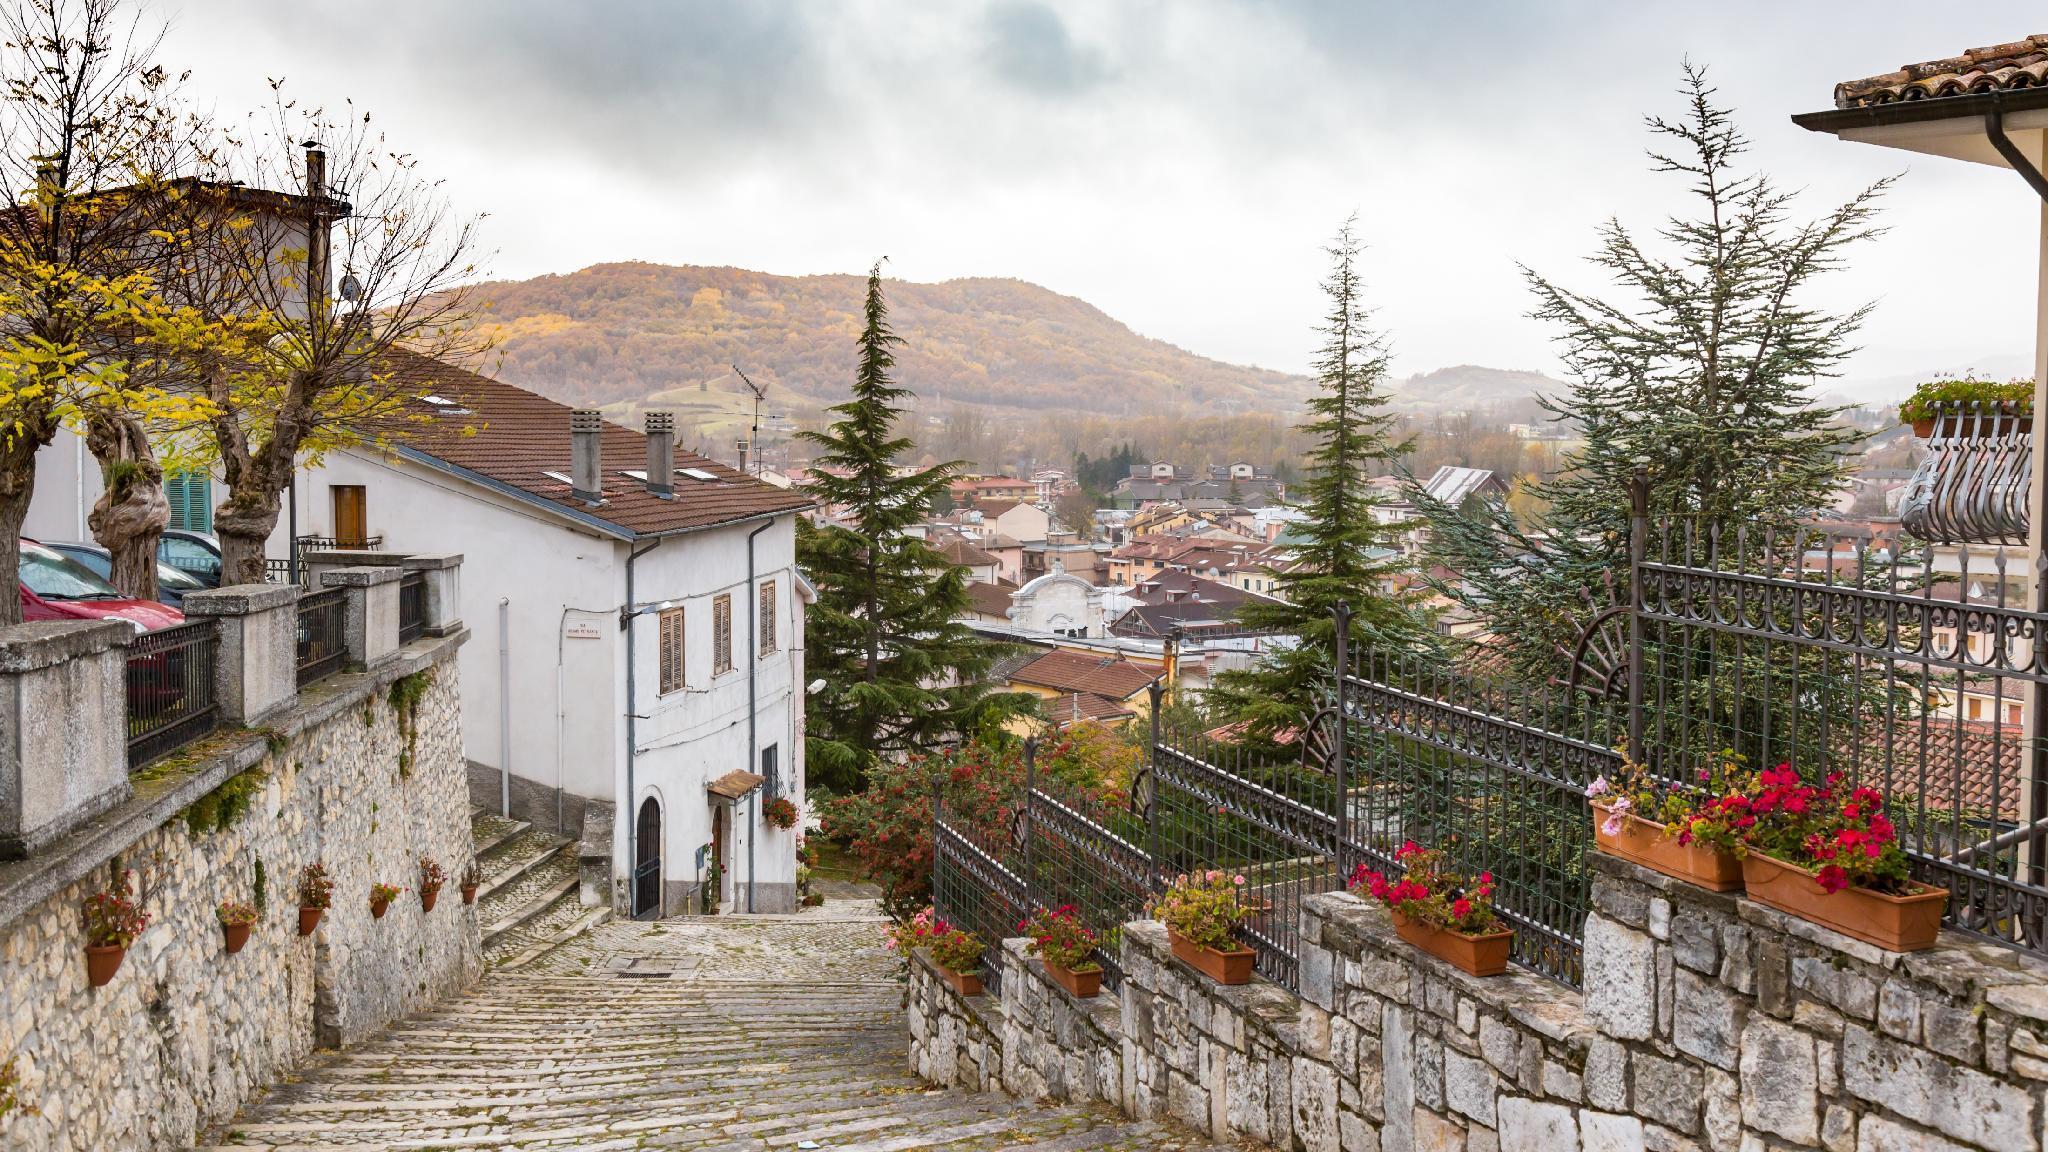 10 best castel di sangro hotels hd photos reviews of hotels in rh agoda com